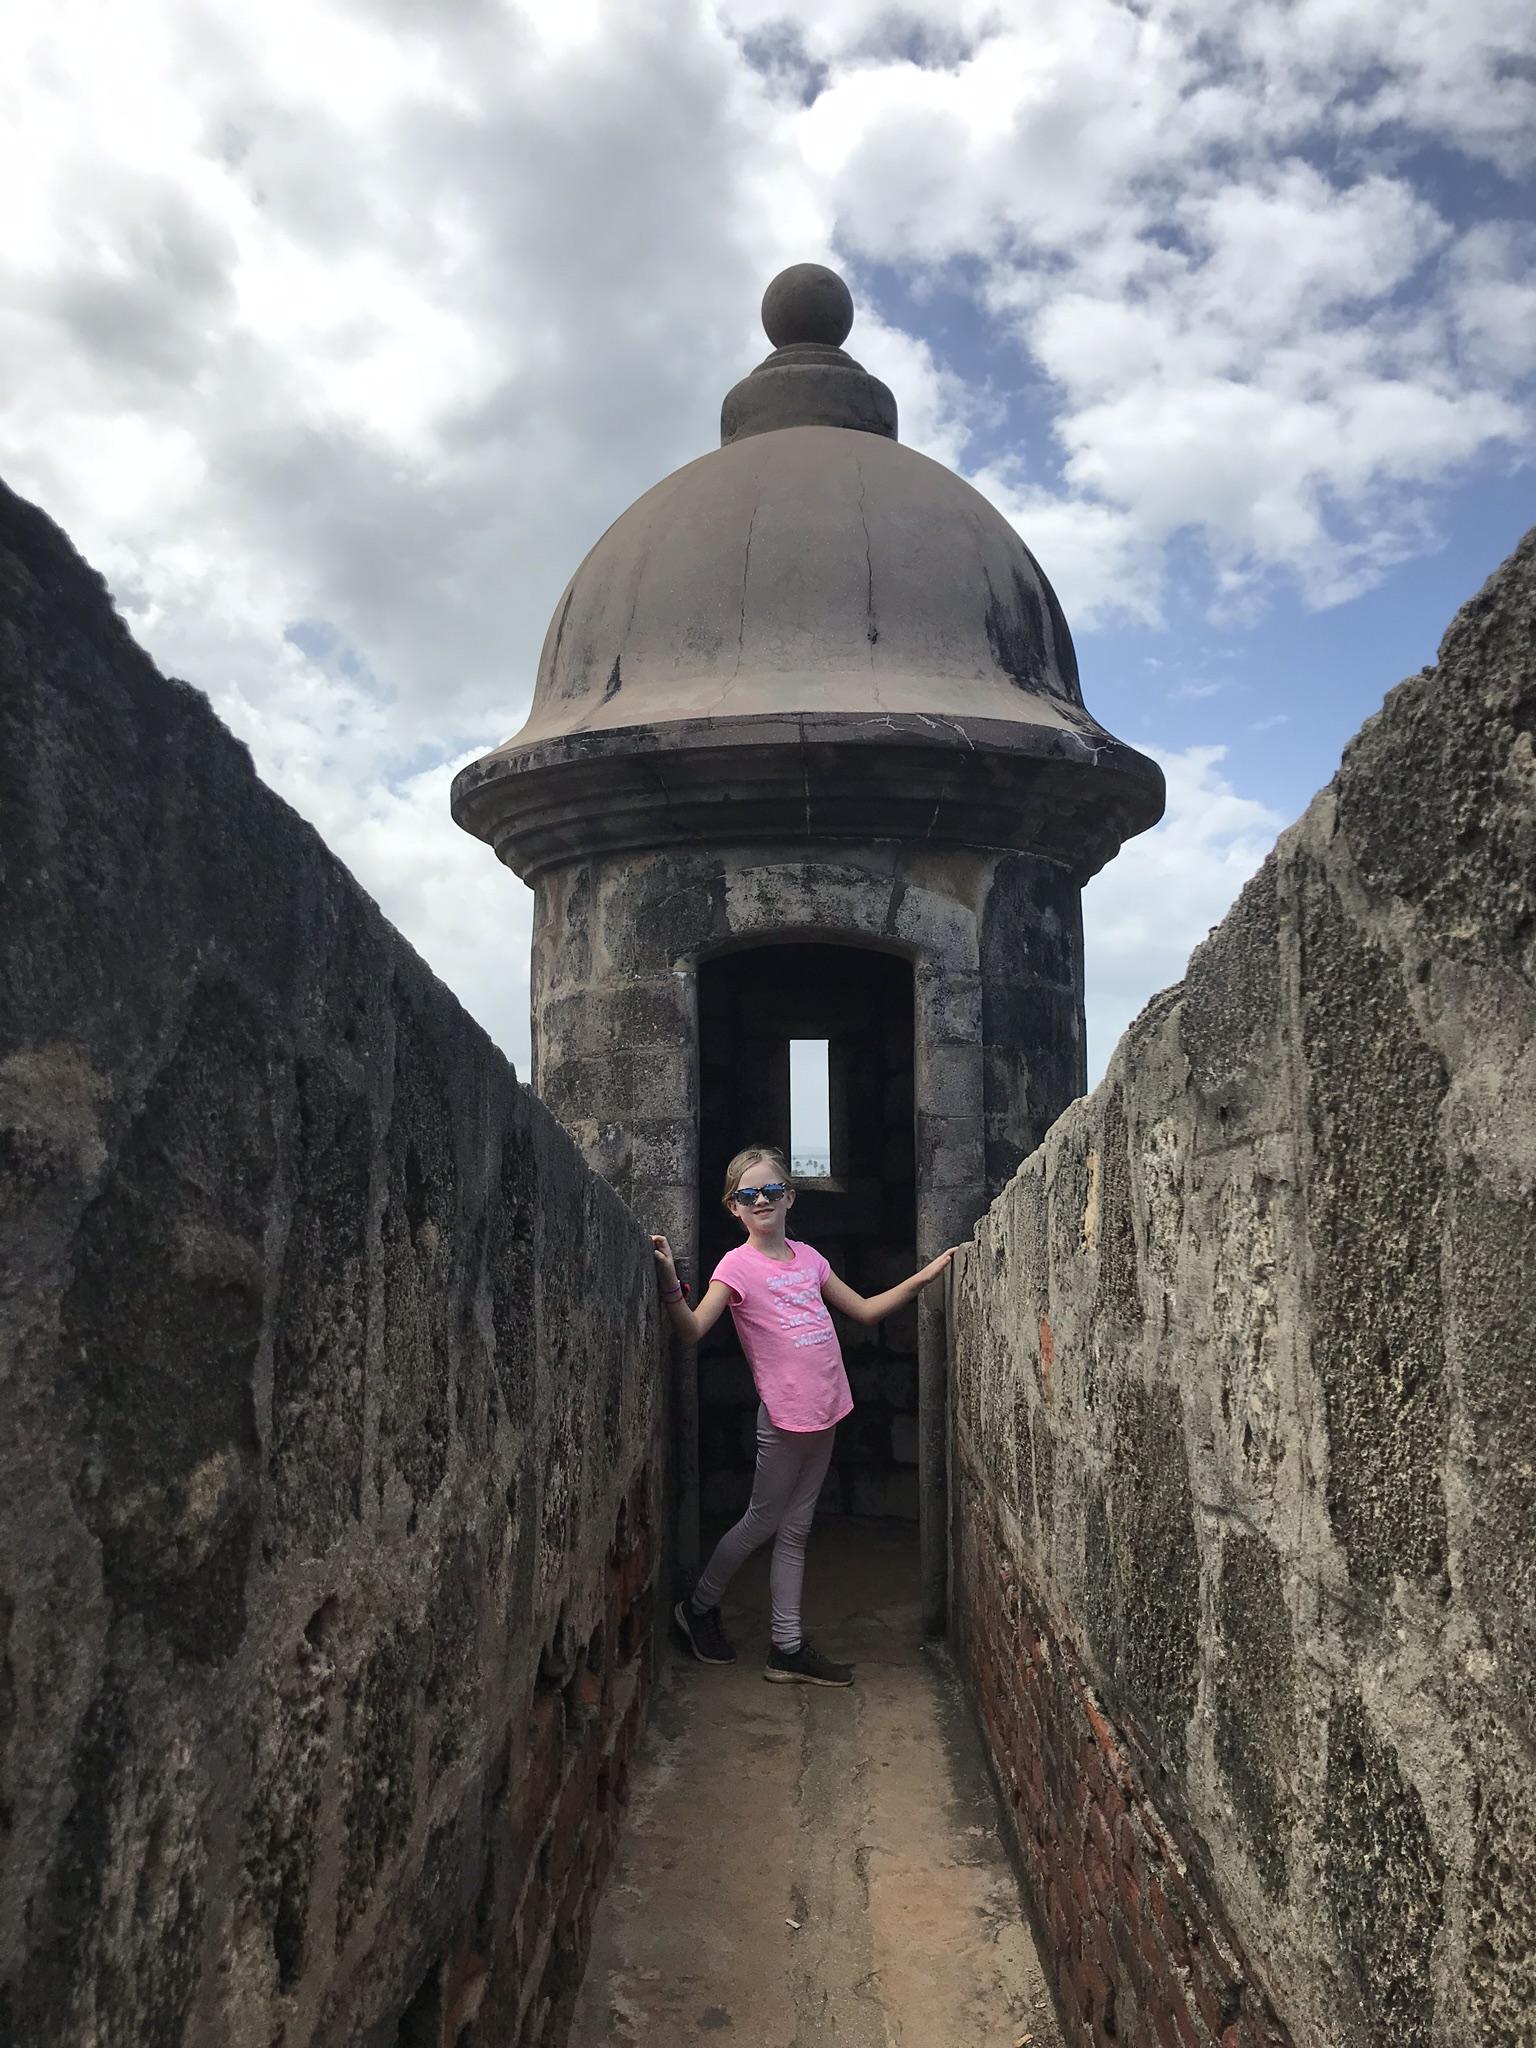 visiting el morro in puerto rico with kids